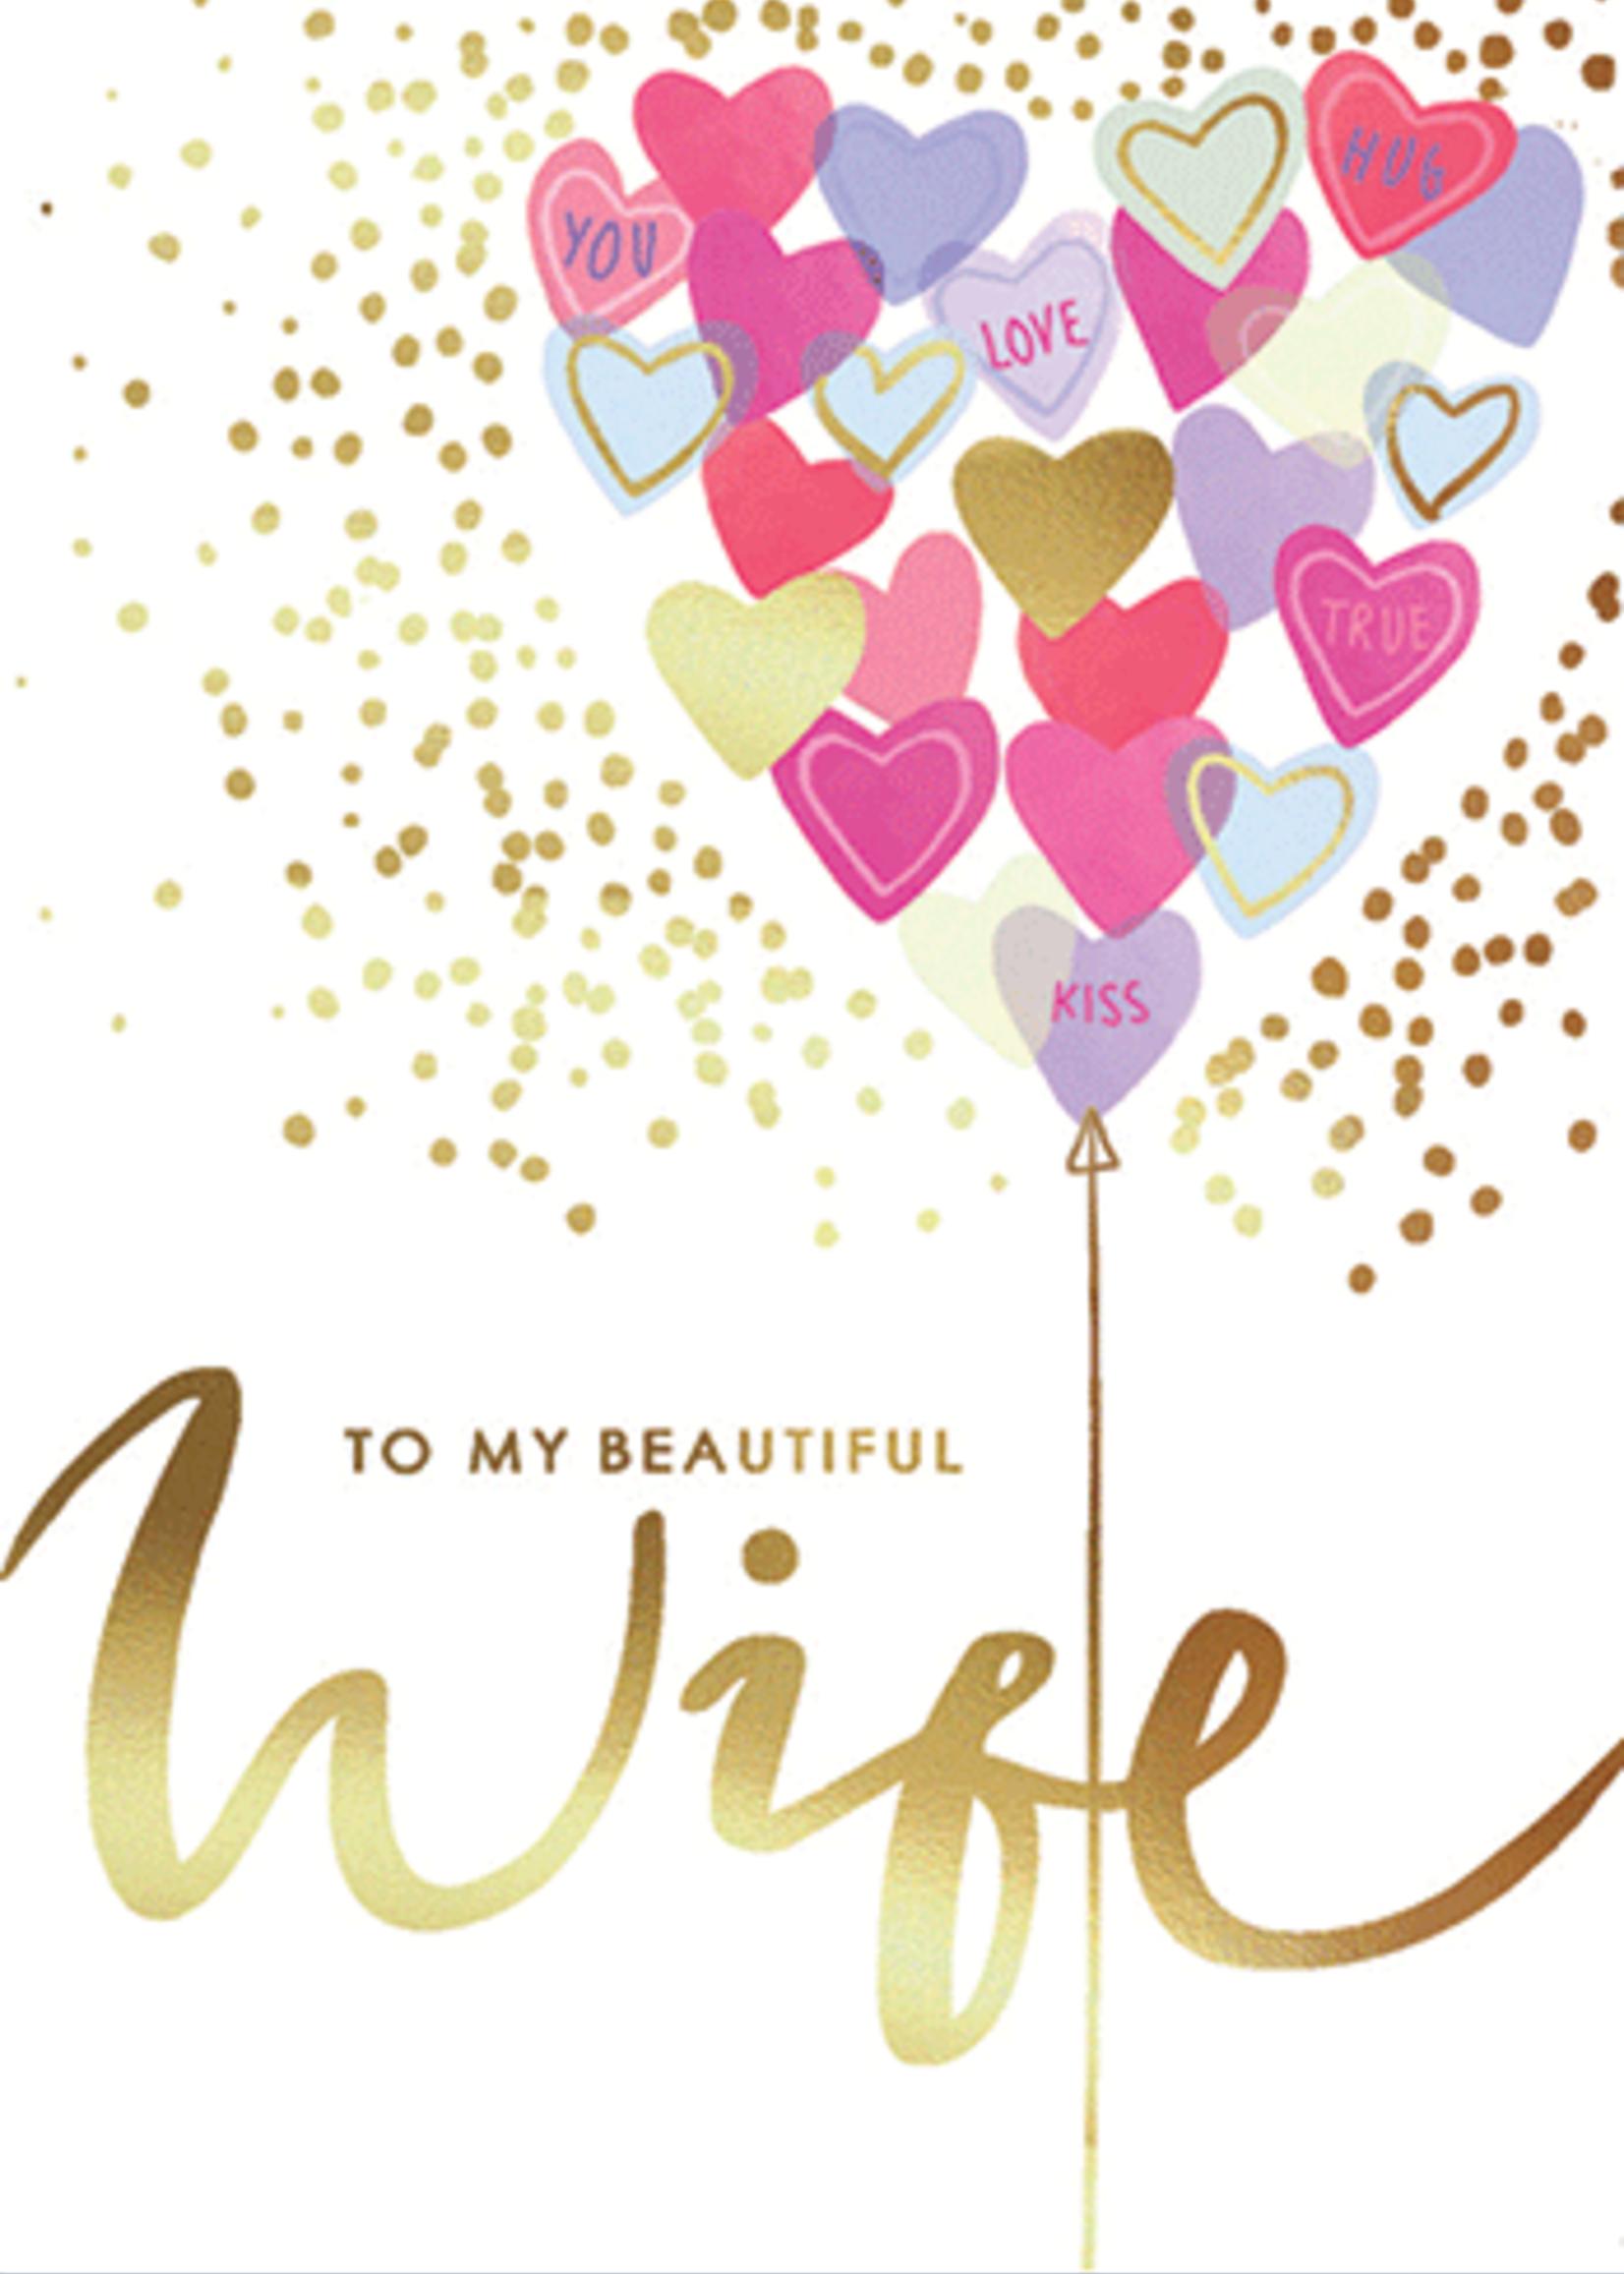 Card VDAY Wife Heart Balloons